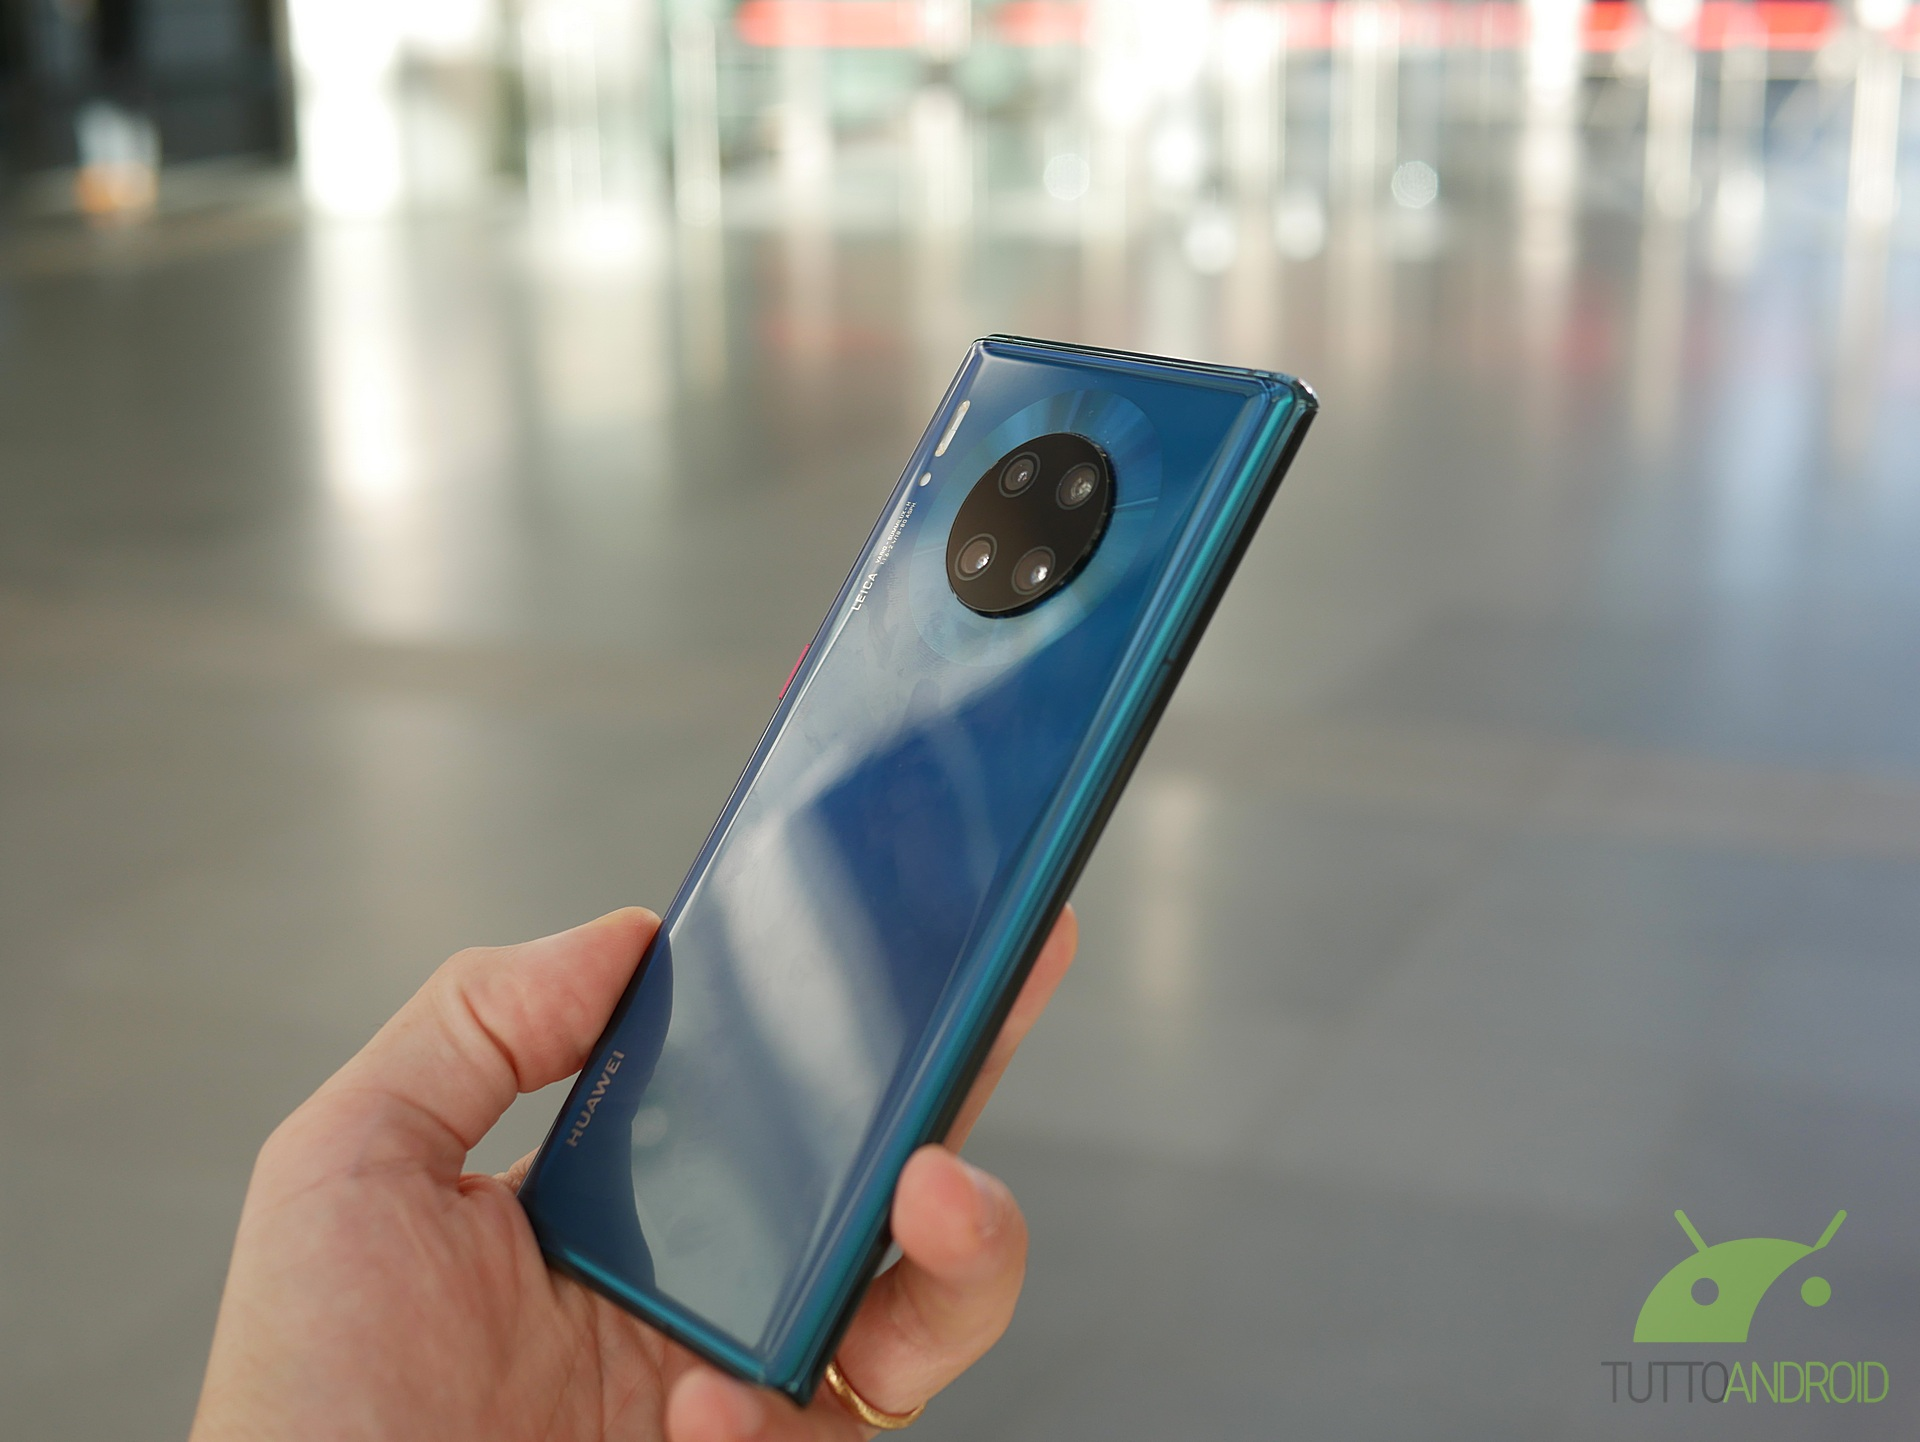 Huawei festeggia un grande traguardo lanciando un Mate 30 Pr